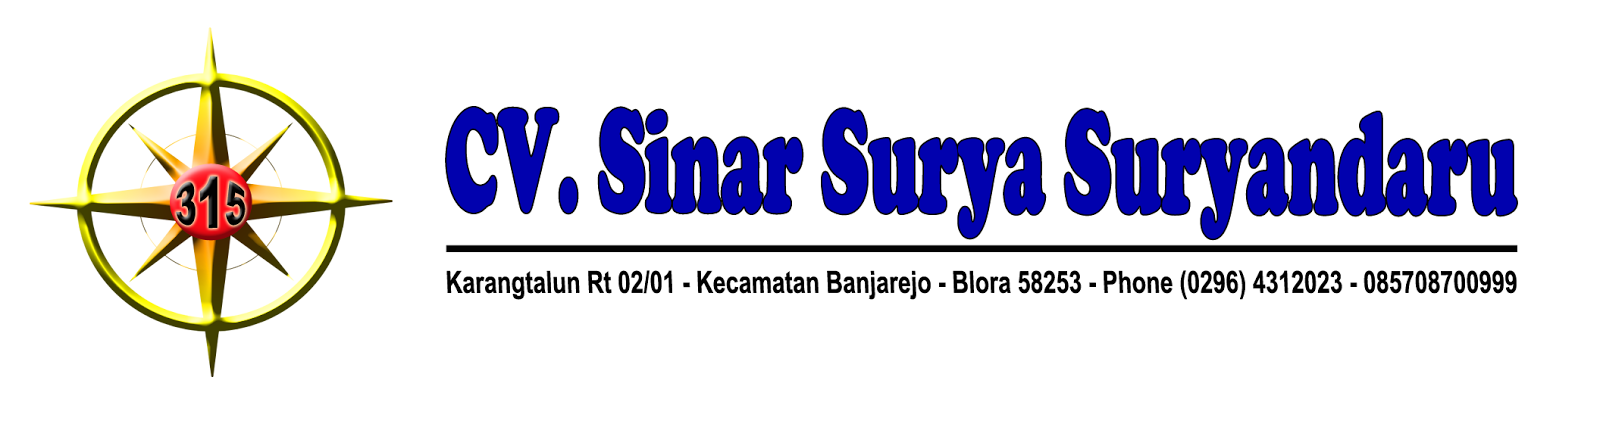 CV. SINAR SURYA SURYANDARU